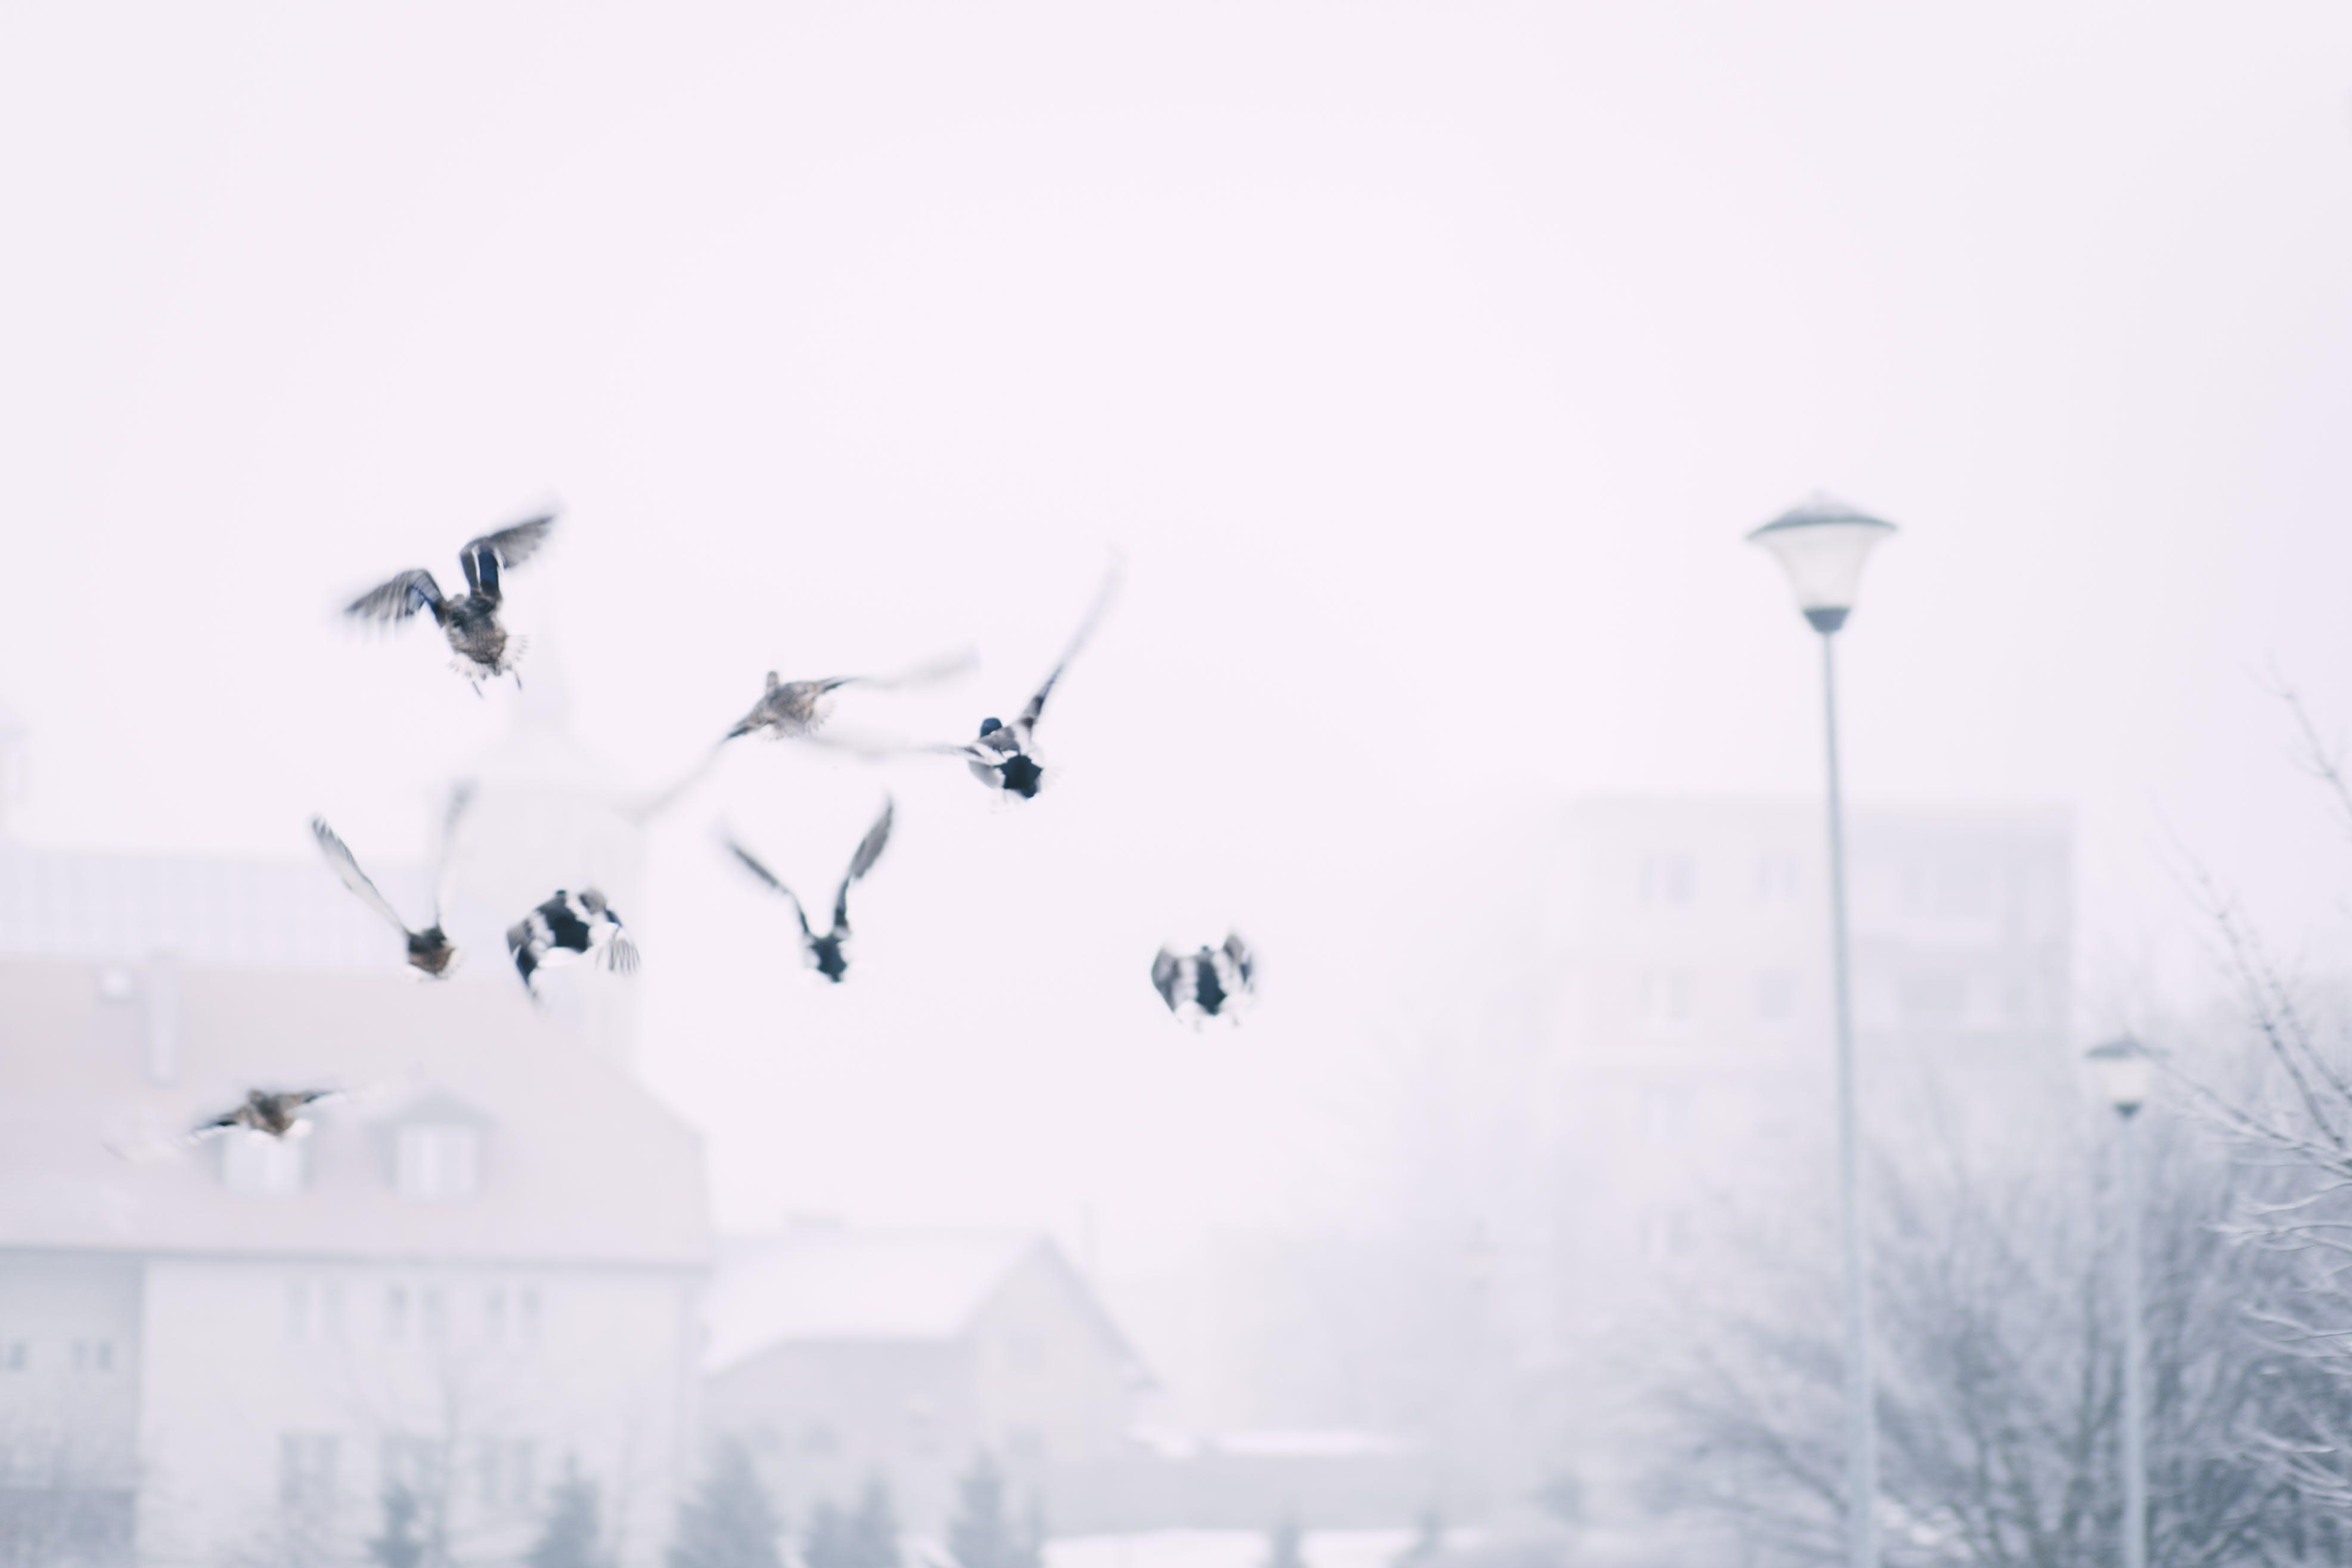 Flock of Flying Birds Above Street